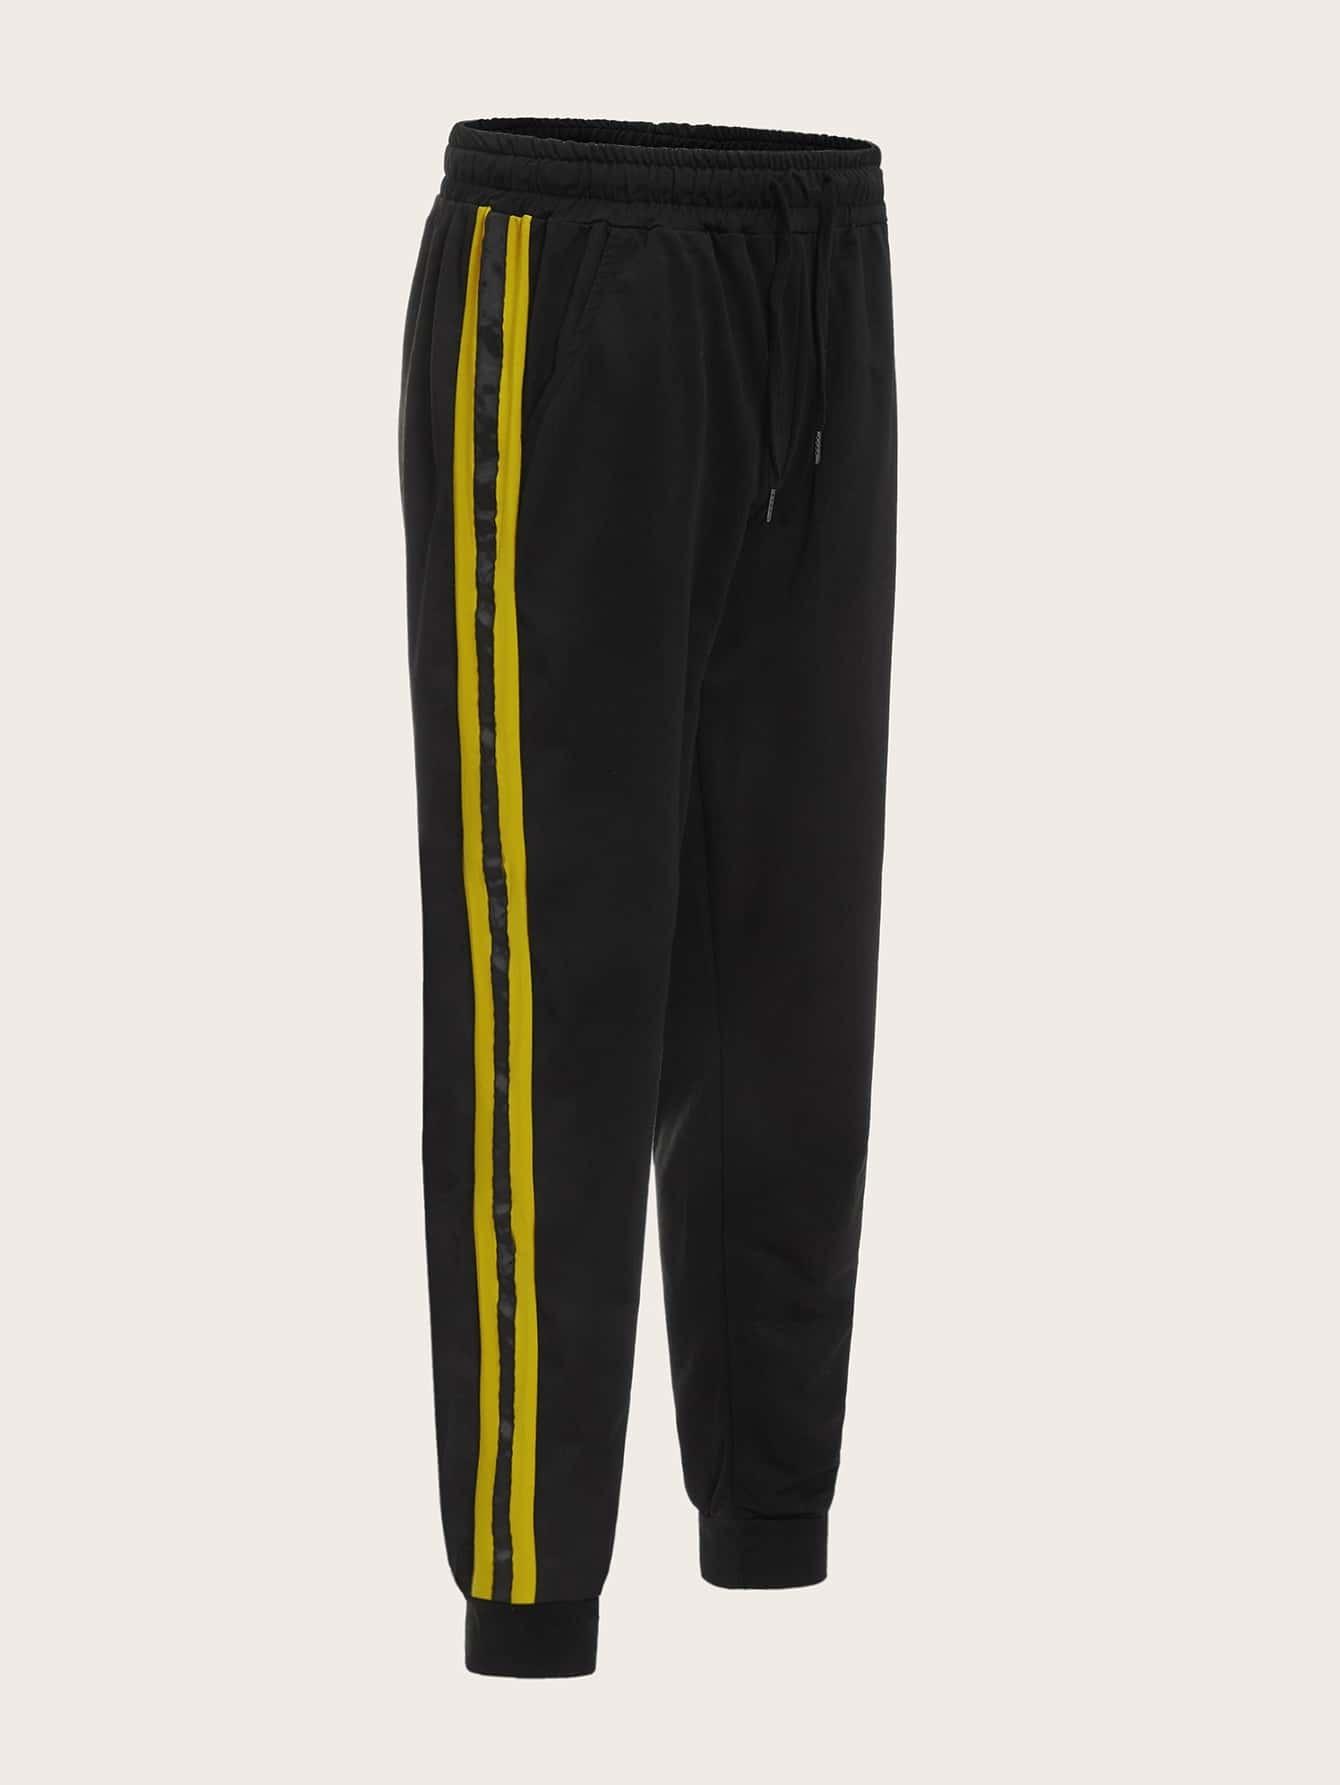 Фото - Мужские брюки с полосками и карманом от SheIn черного цвета